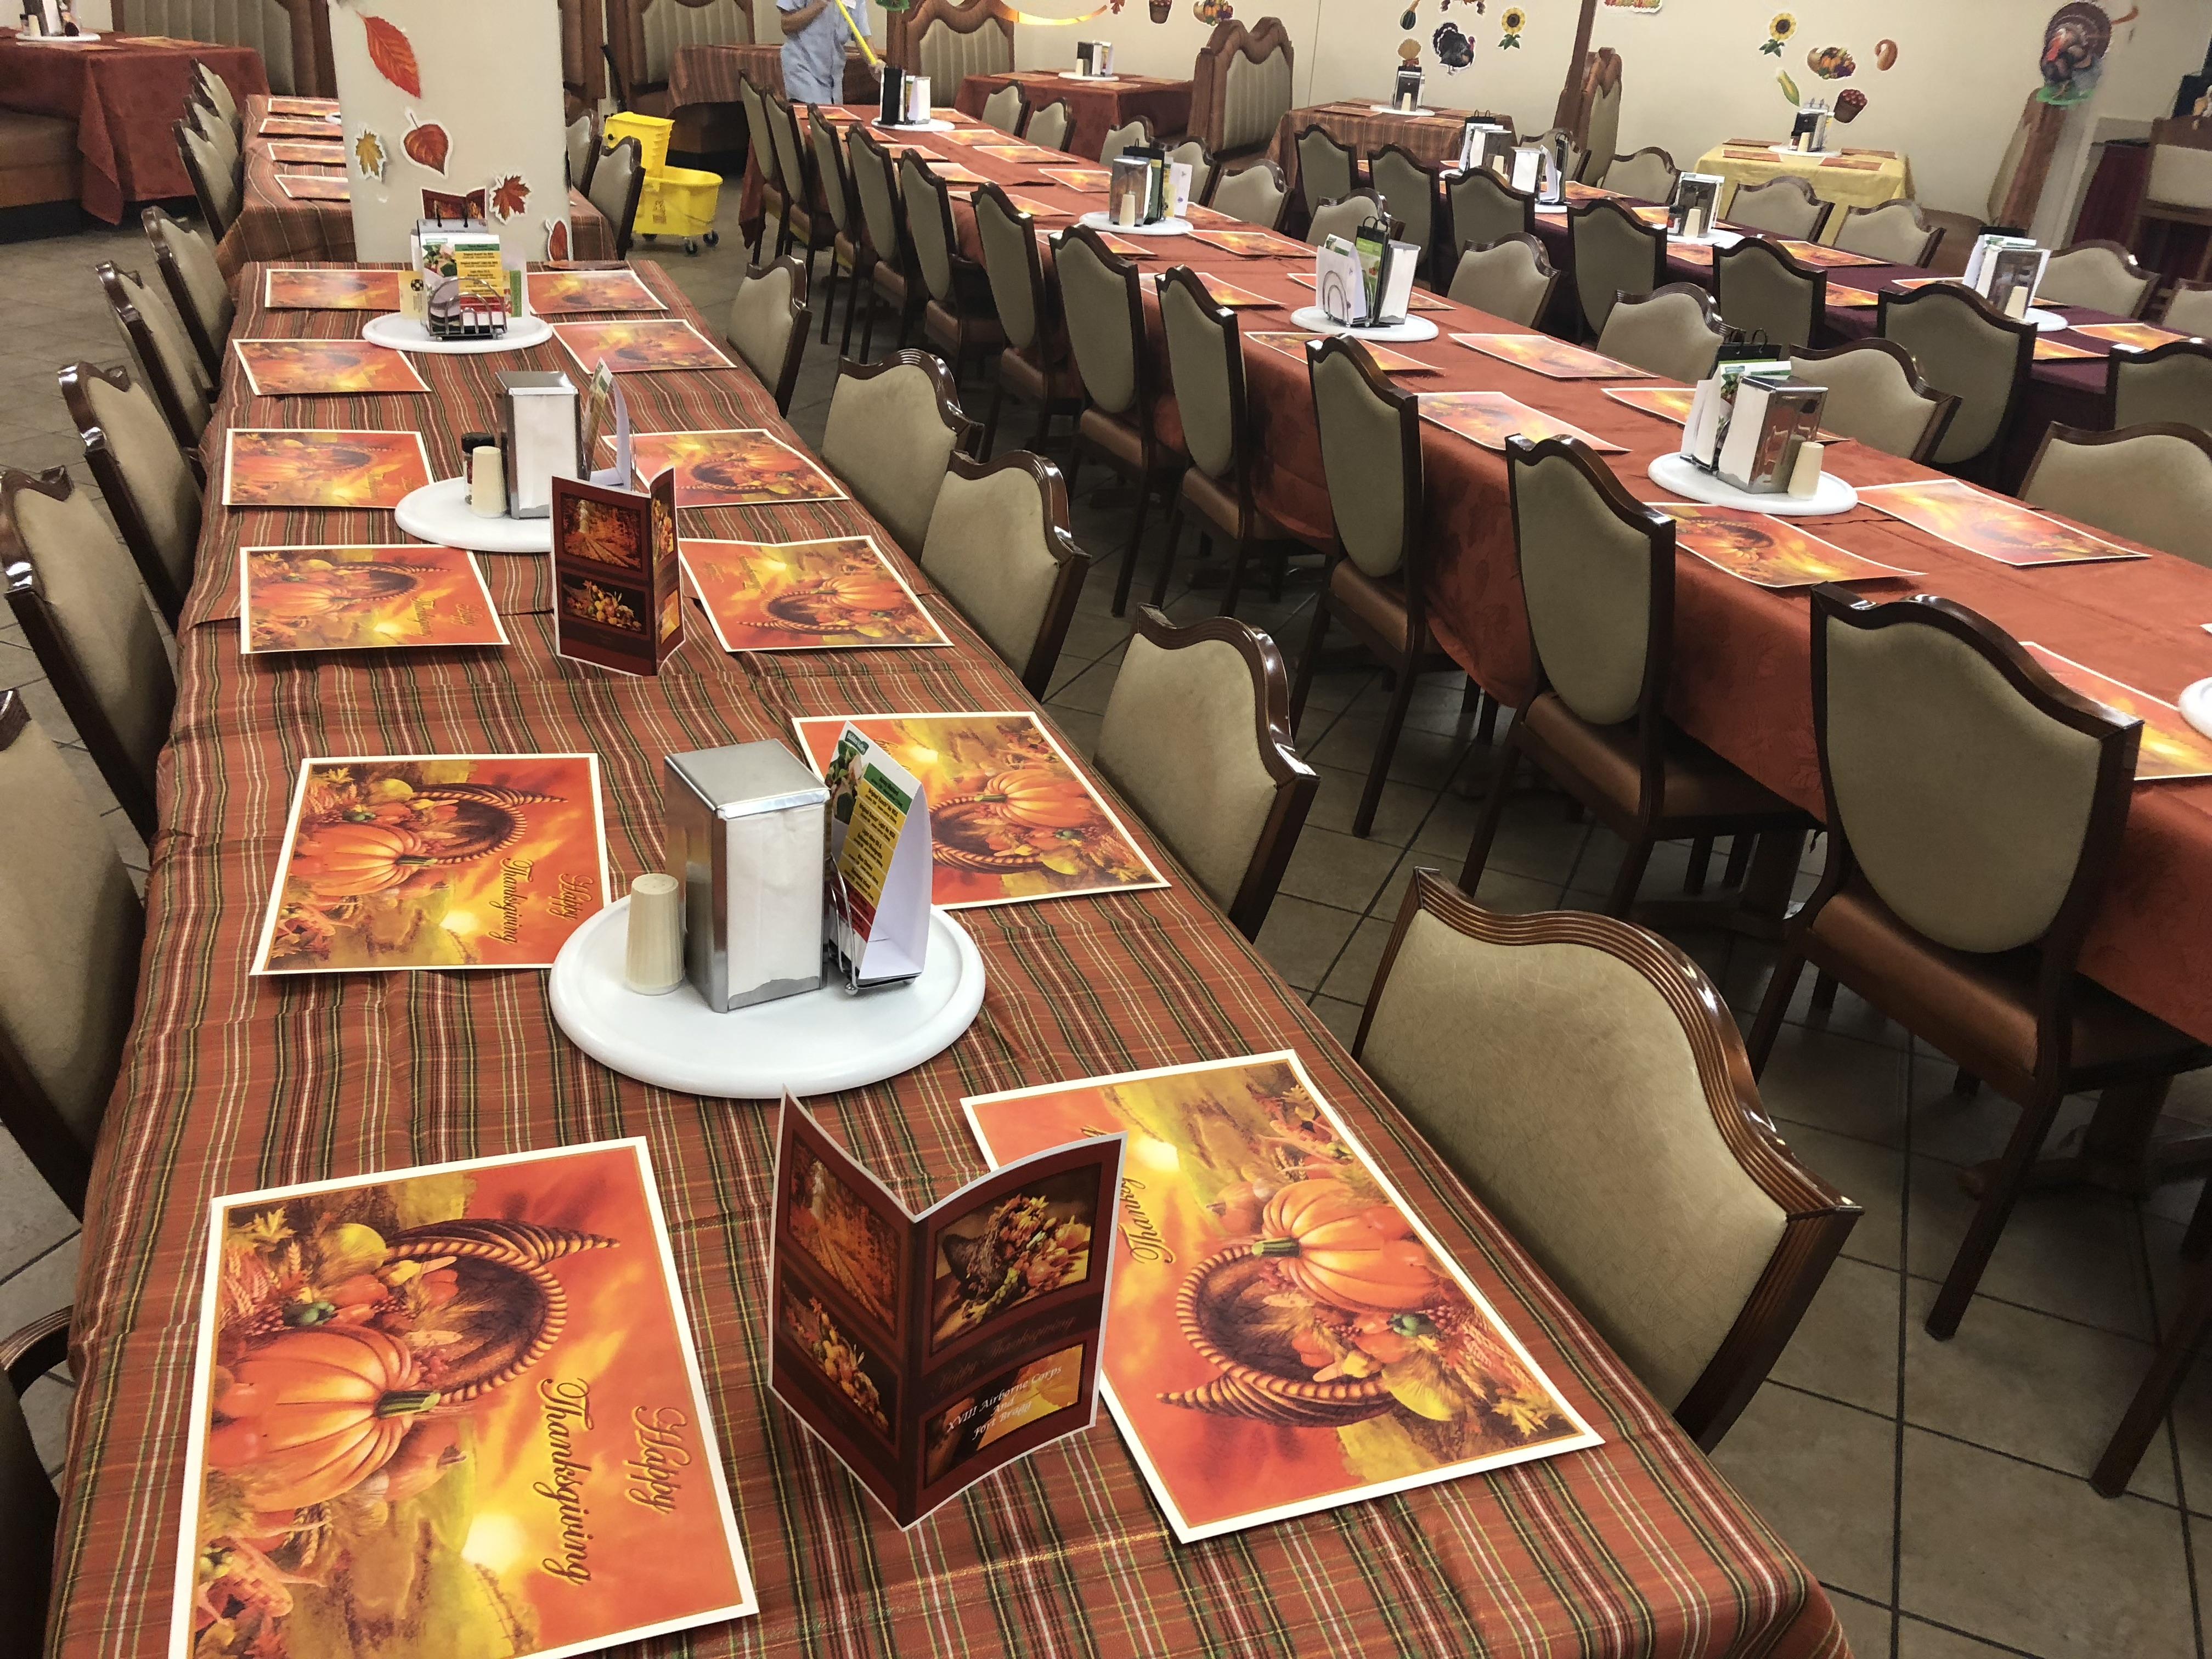 <div class='meta'><div class='origin-logo' data-origin='WTVD'></div><span class='caption-text' data-credit='Akilah Davis'>Fort Bragg soldiers prepare for a Thanksgiving feast.</span></div>